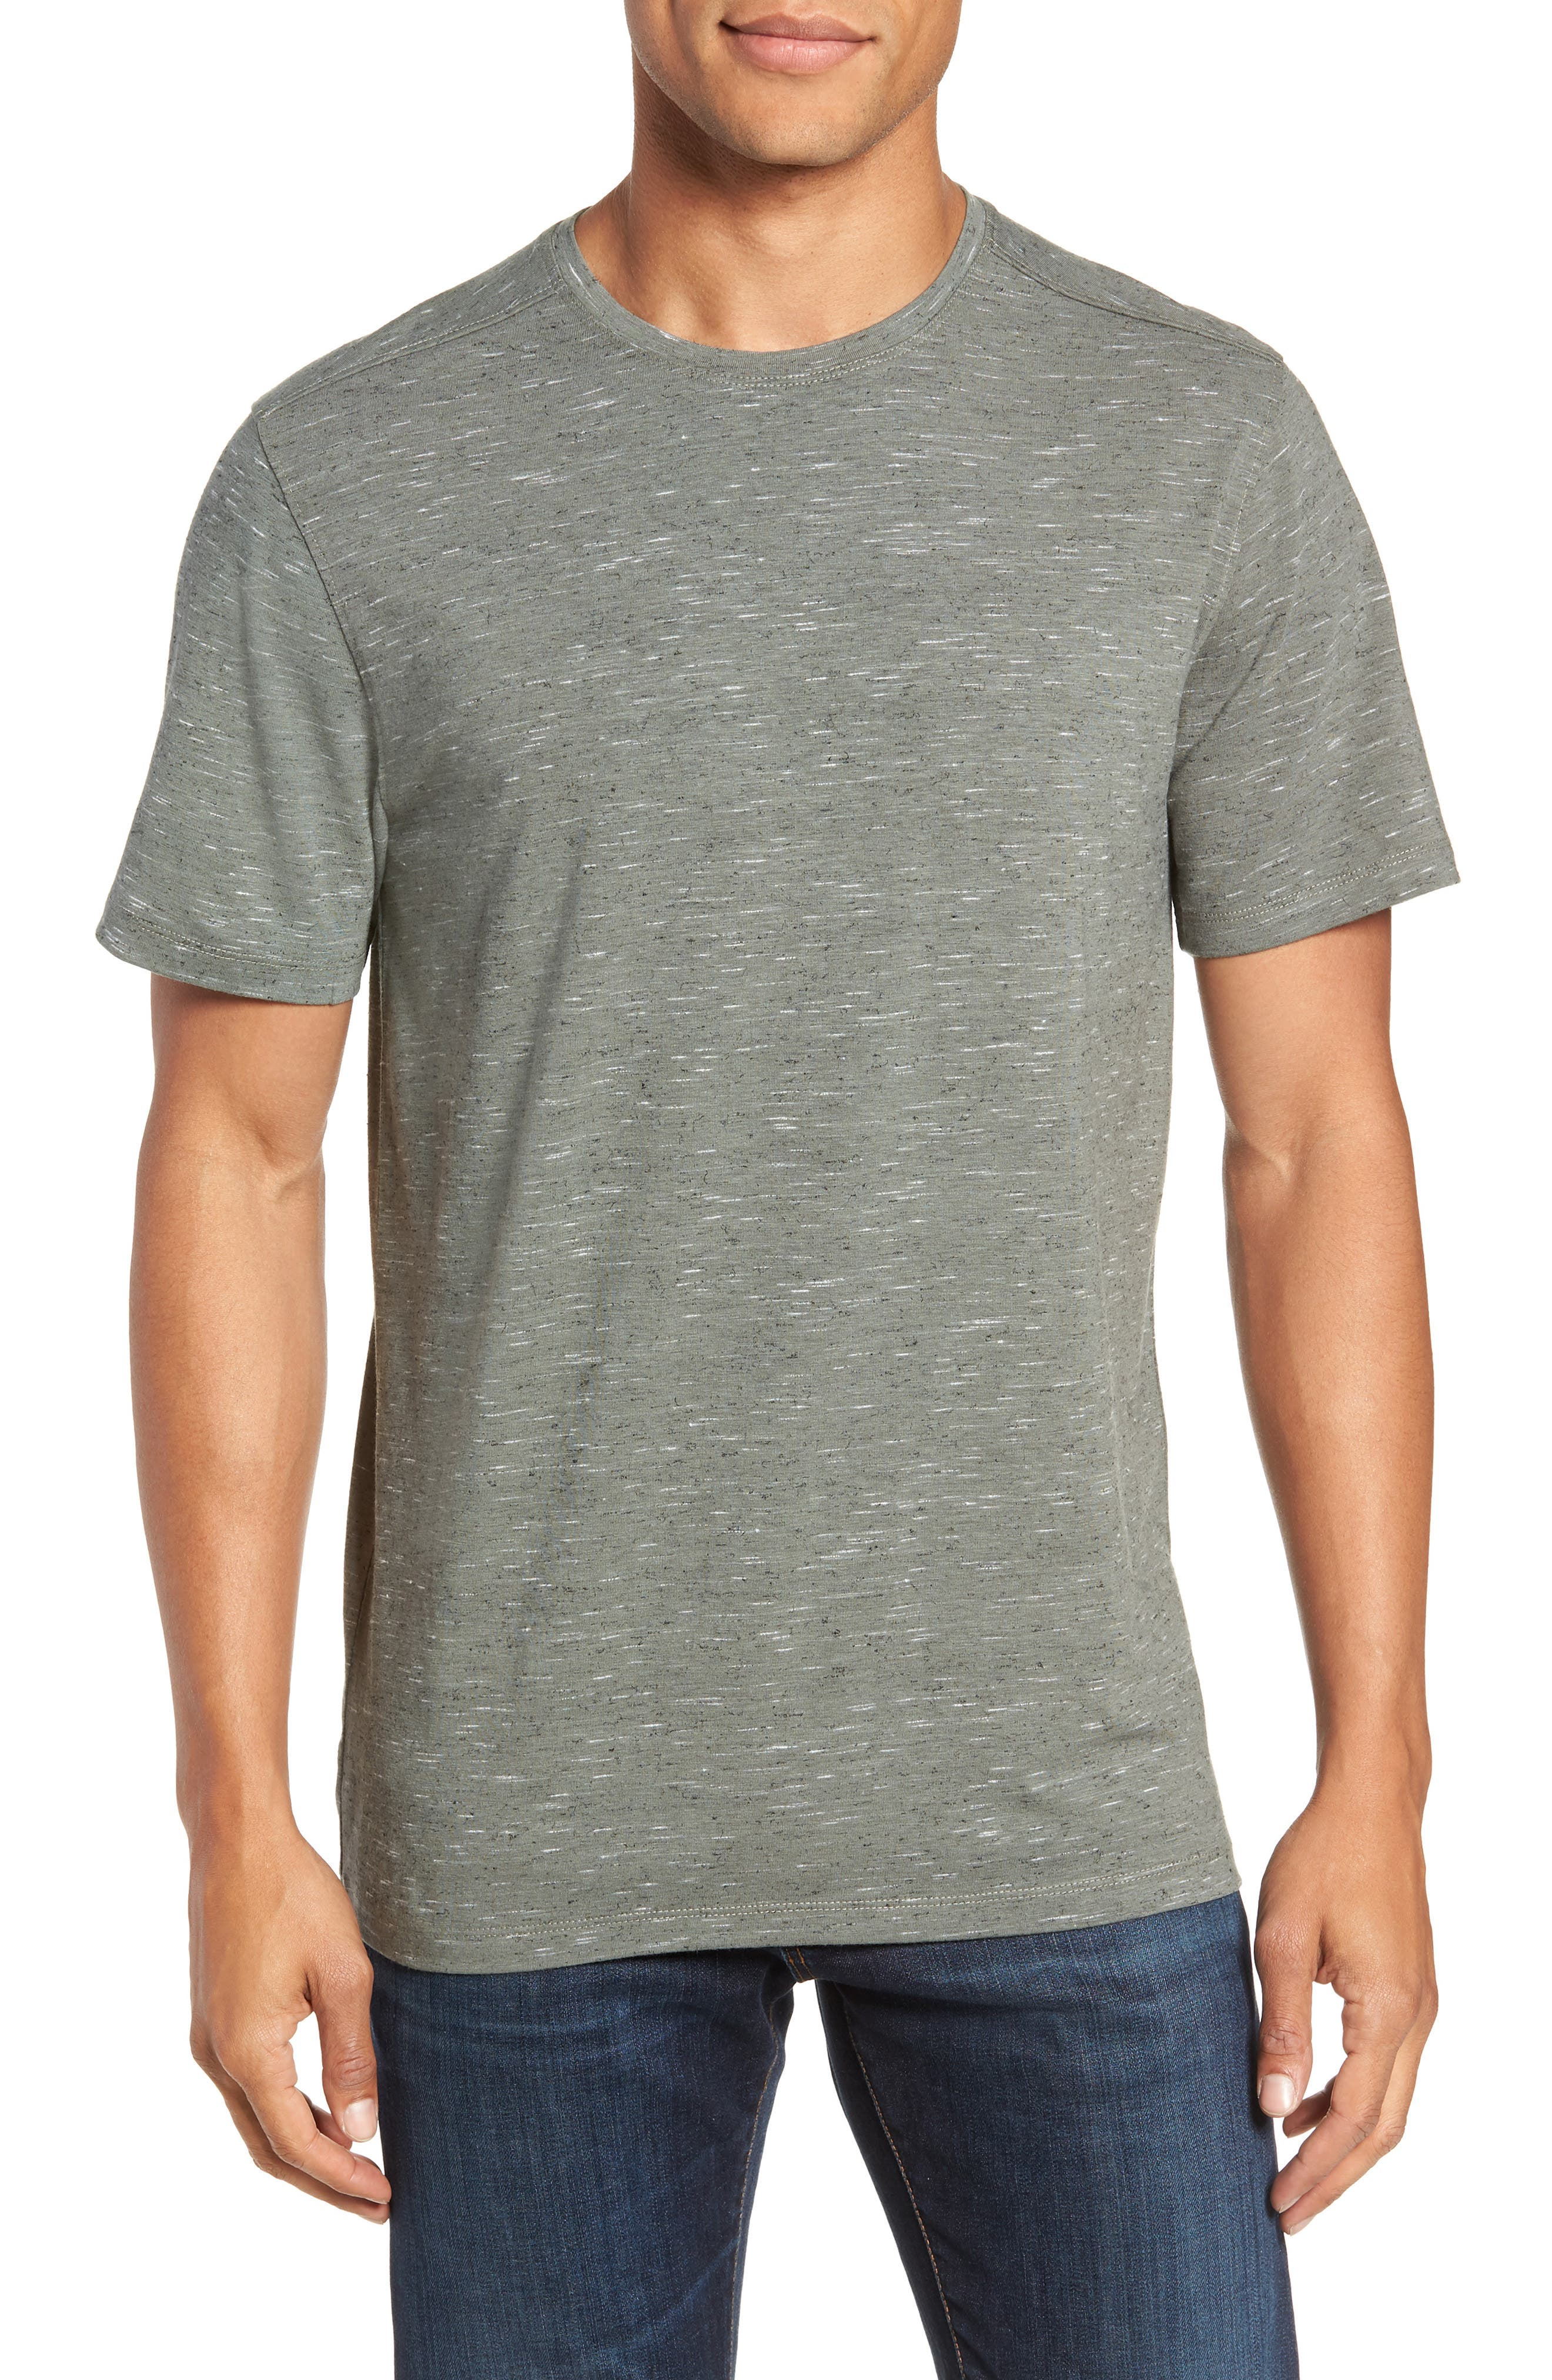 Neppy Crewneck T-Shirt,                             Main thumbnail 1, color,                             GREY LUNAR NEP